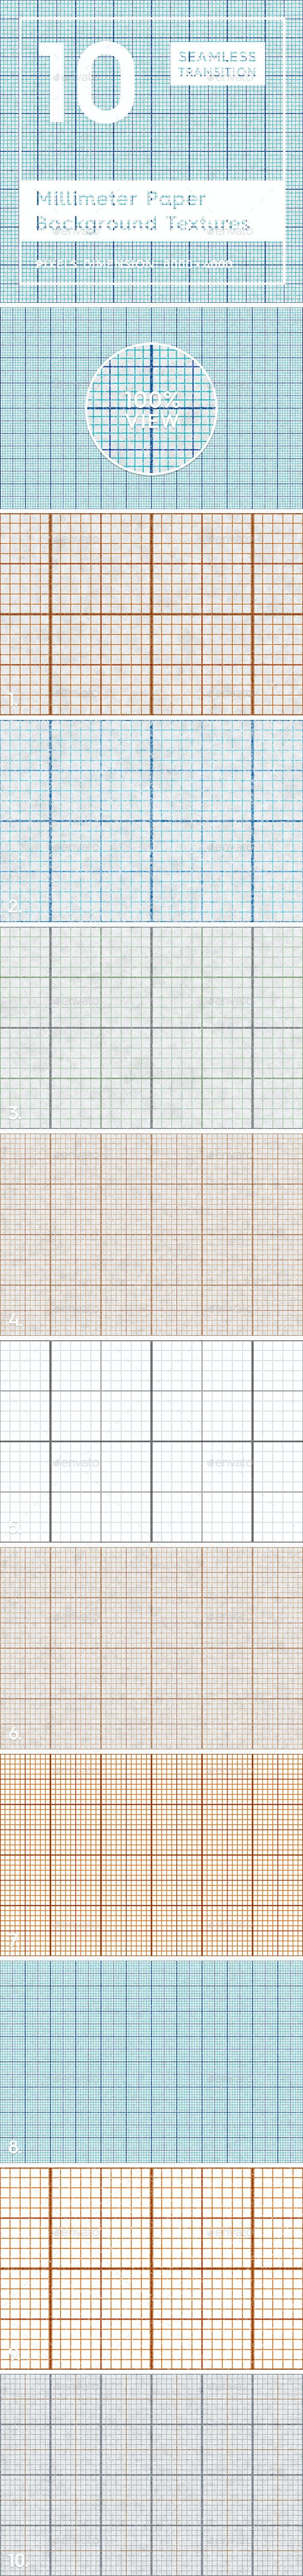 10 Millimeter Paper Background Textures - Tech / Futuristic Backgrounds